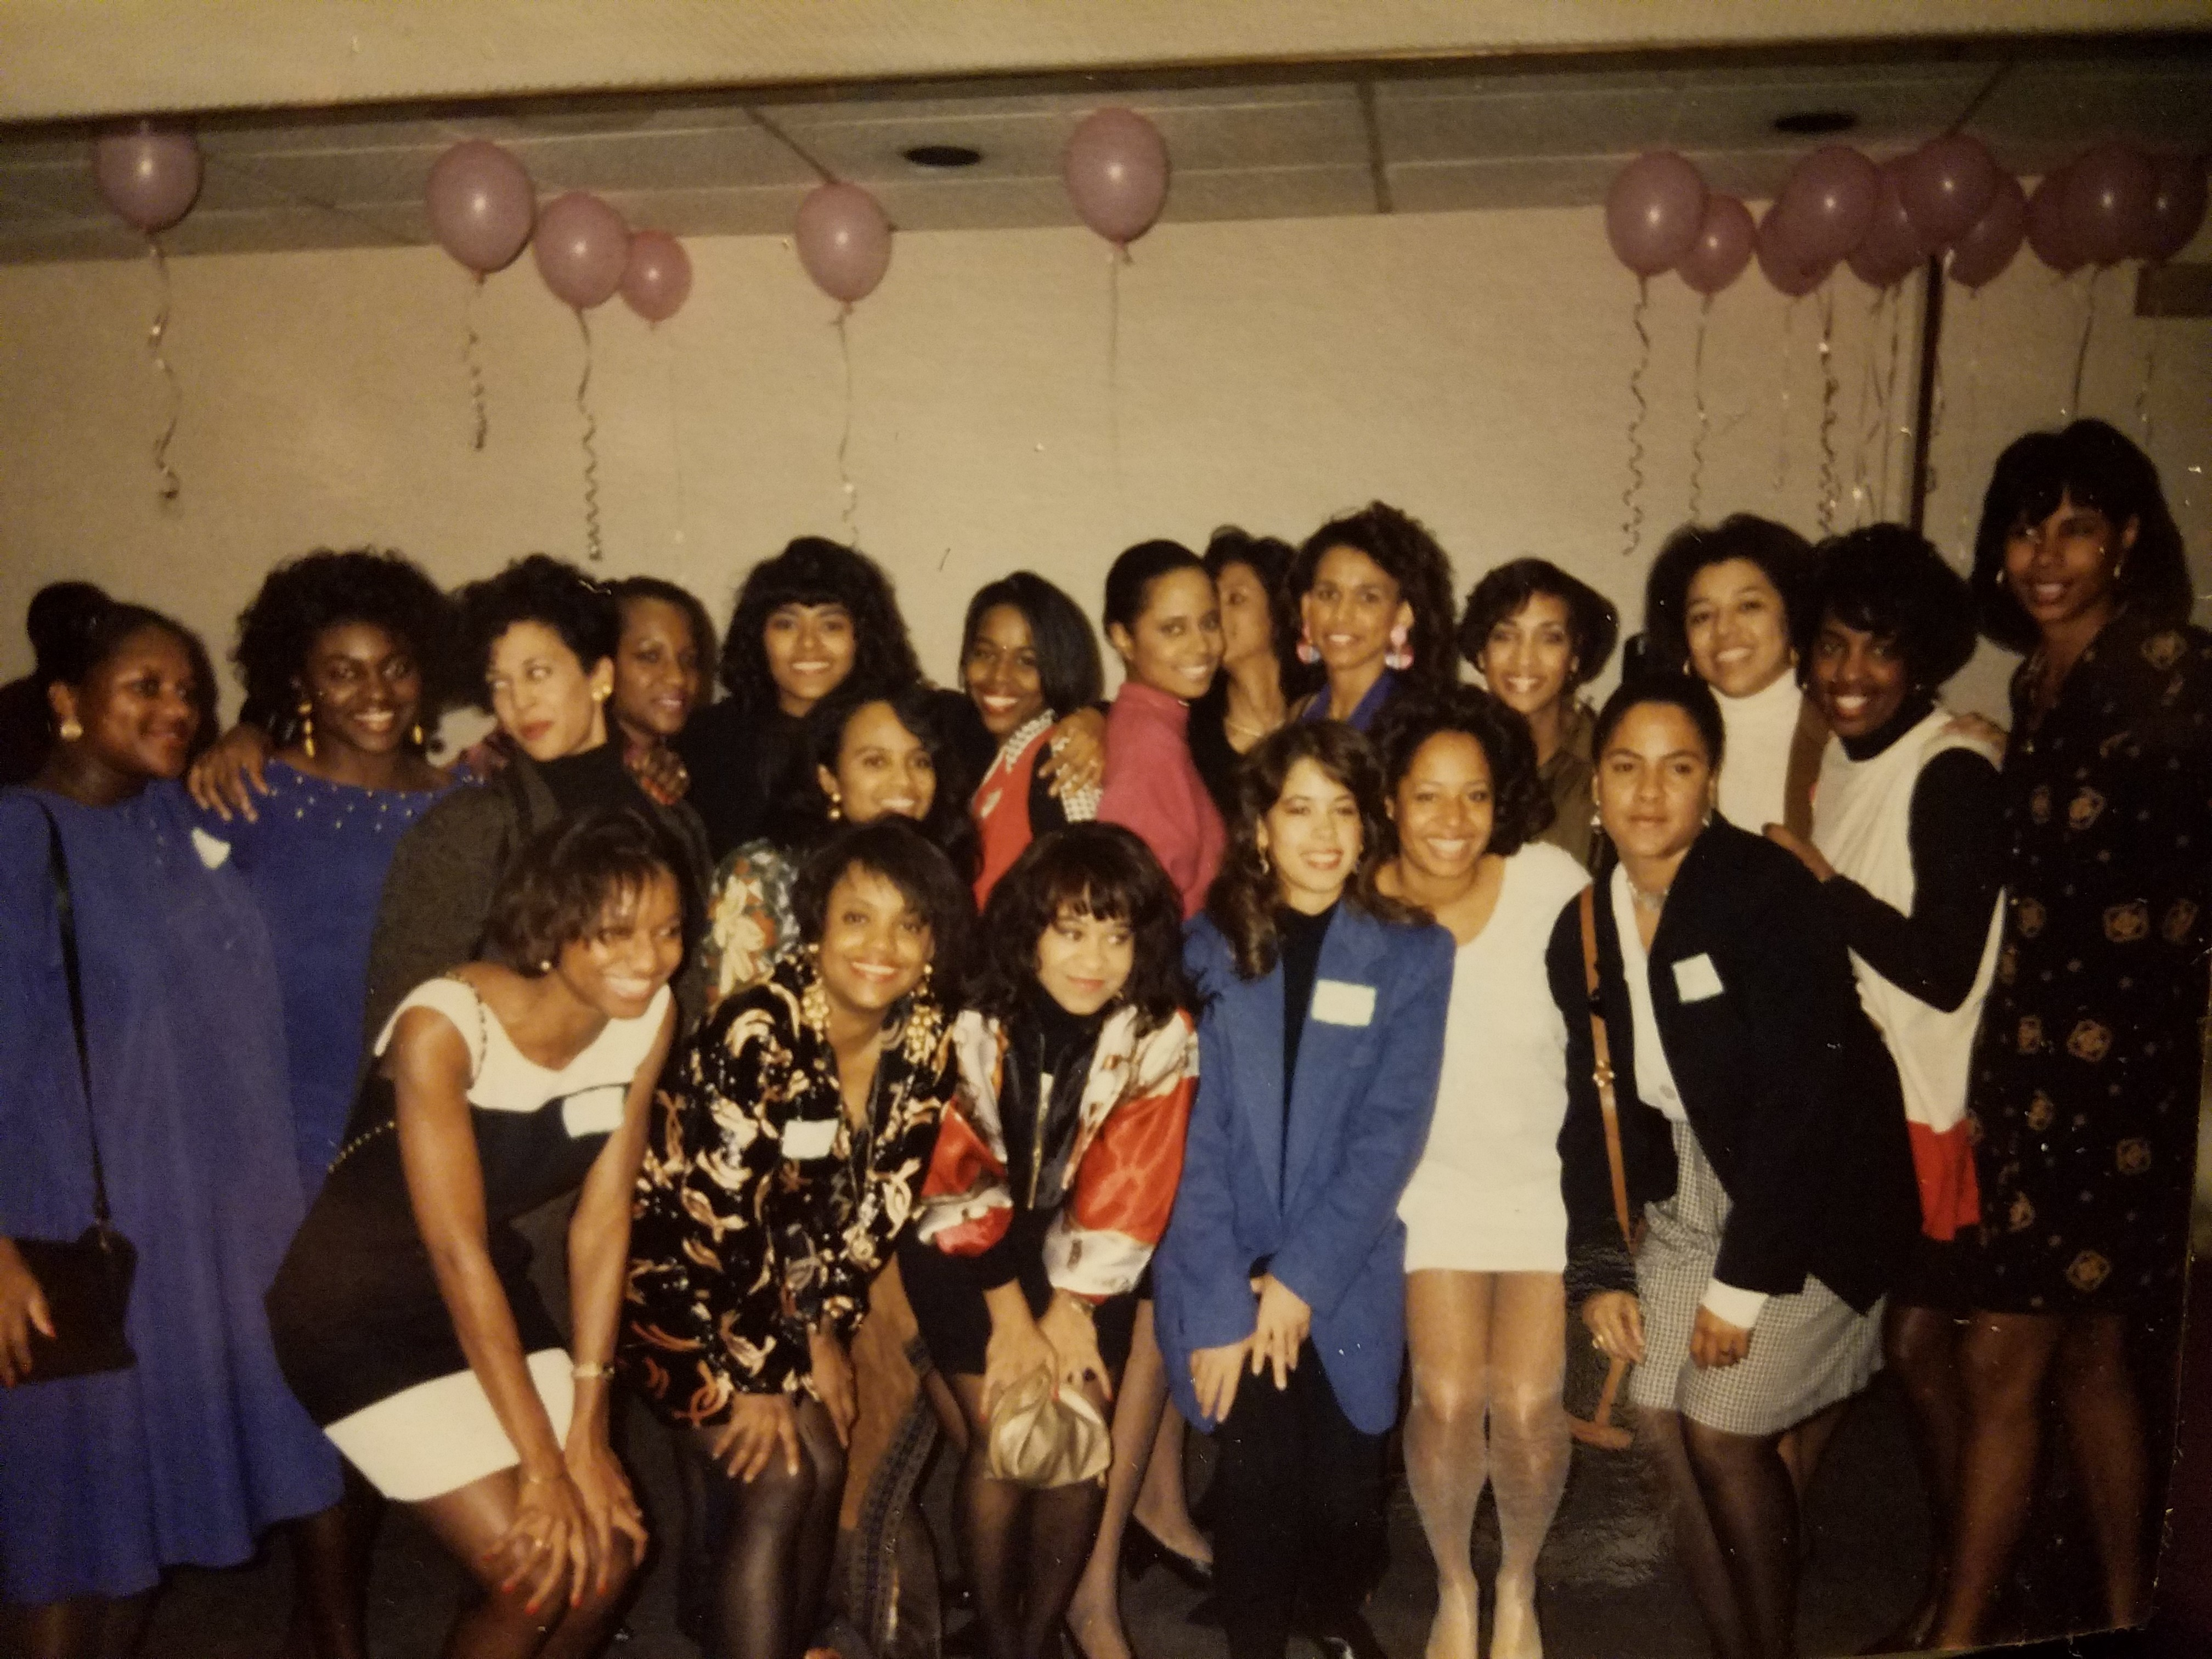 From Howard to VP: Kamala Harris' Alpha Kappa Alpha Sisters Keep Her Centered